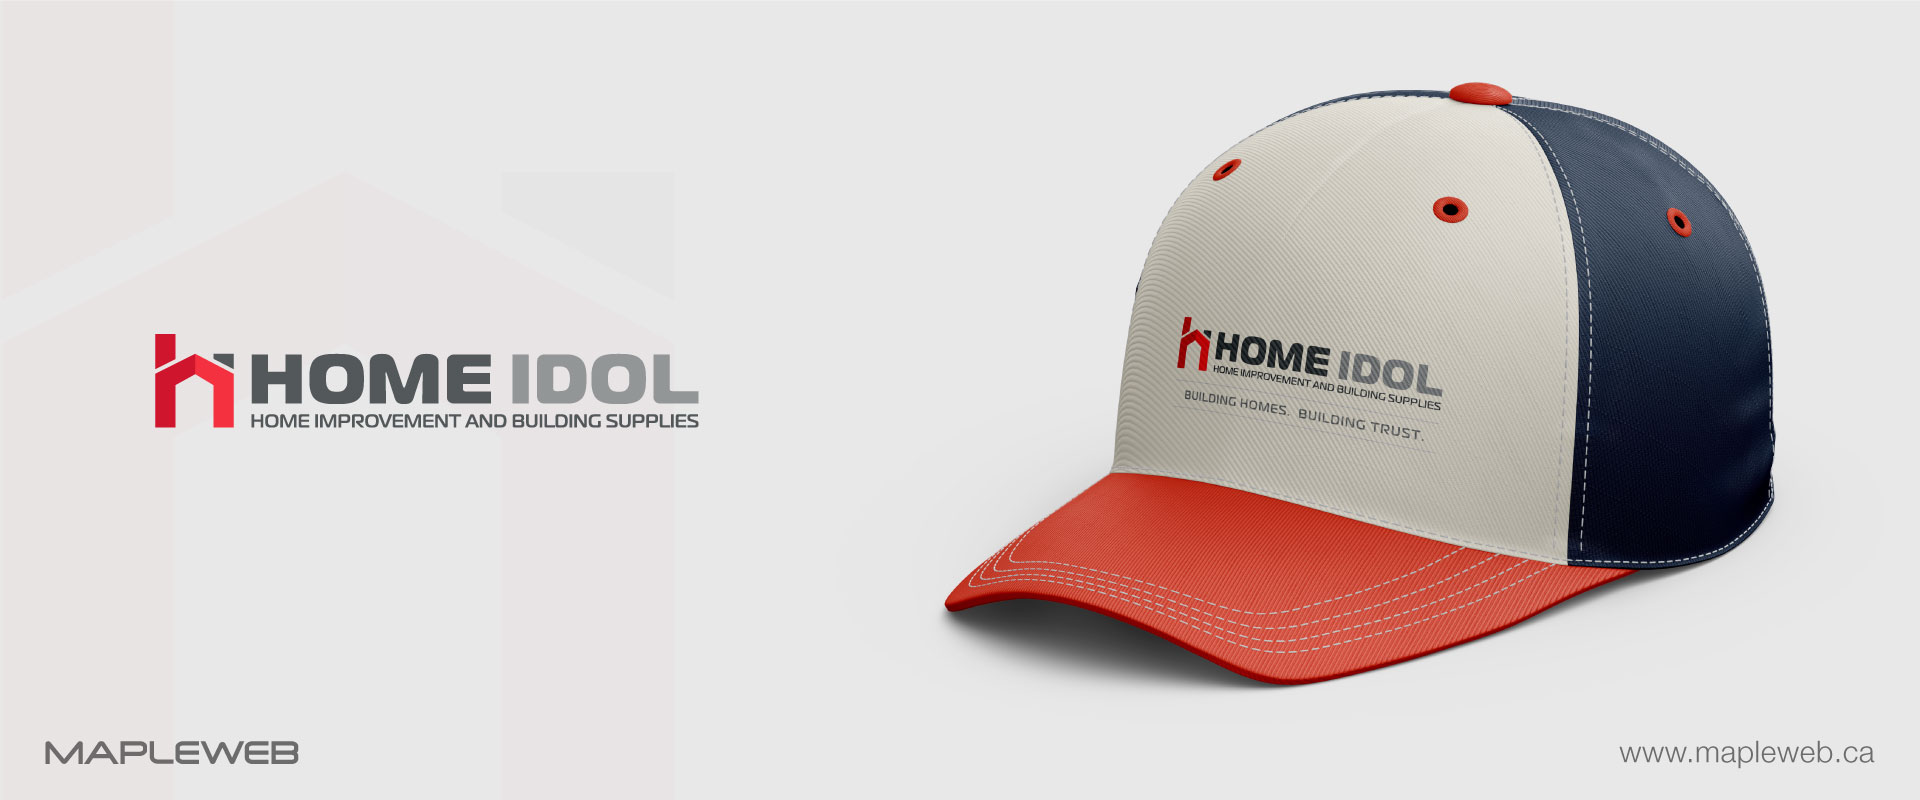 home-idol-brand-logo-design-by-mapleweb-vancouver-canada-cap-mock